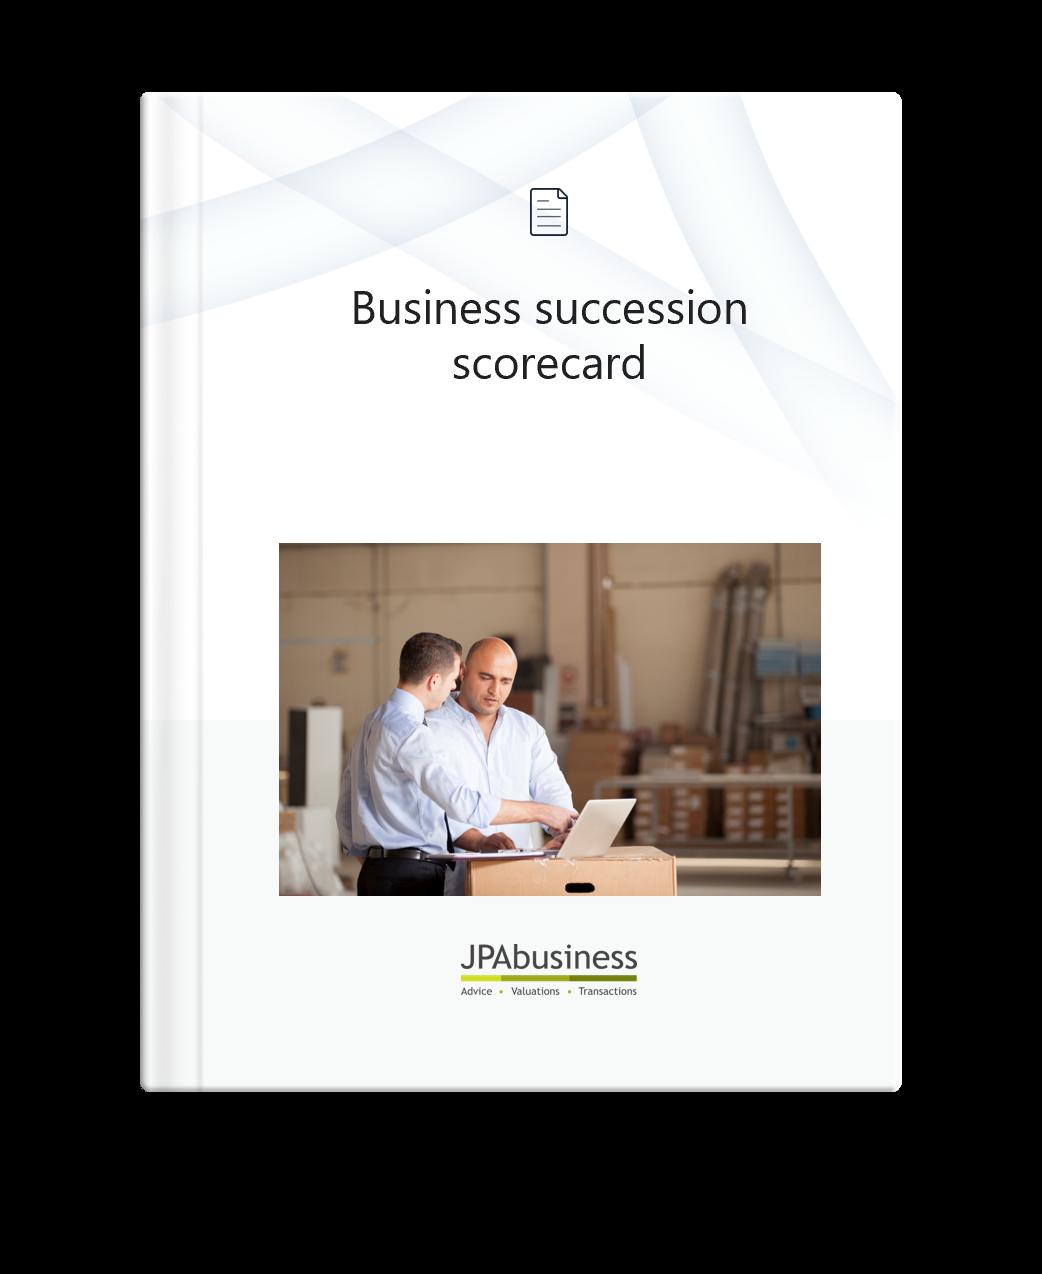 The_Business_Succession_Scorecard